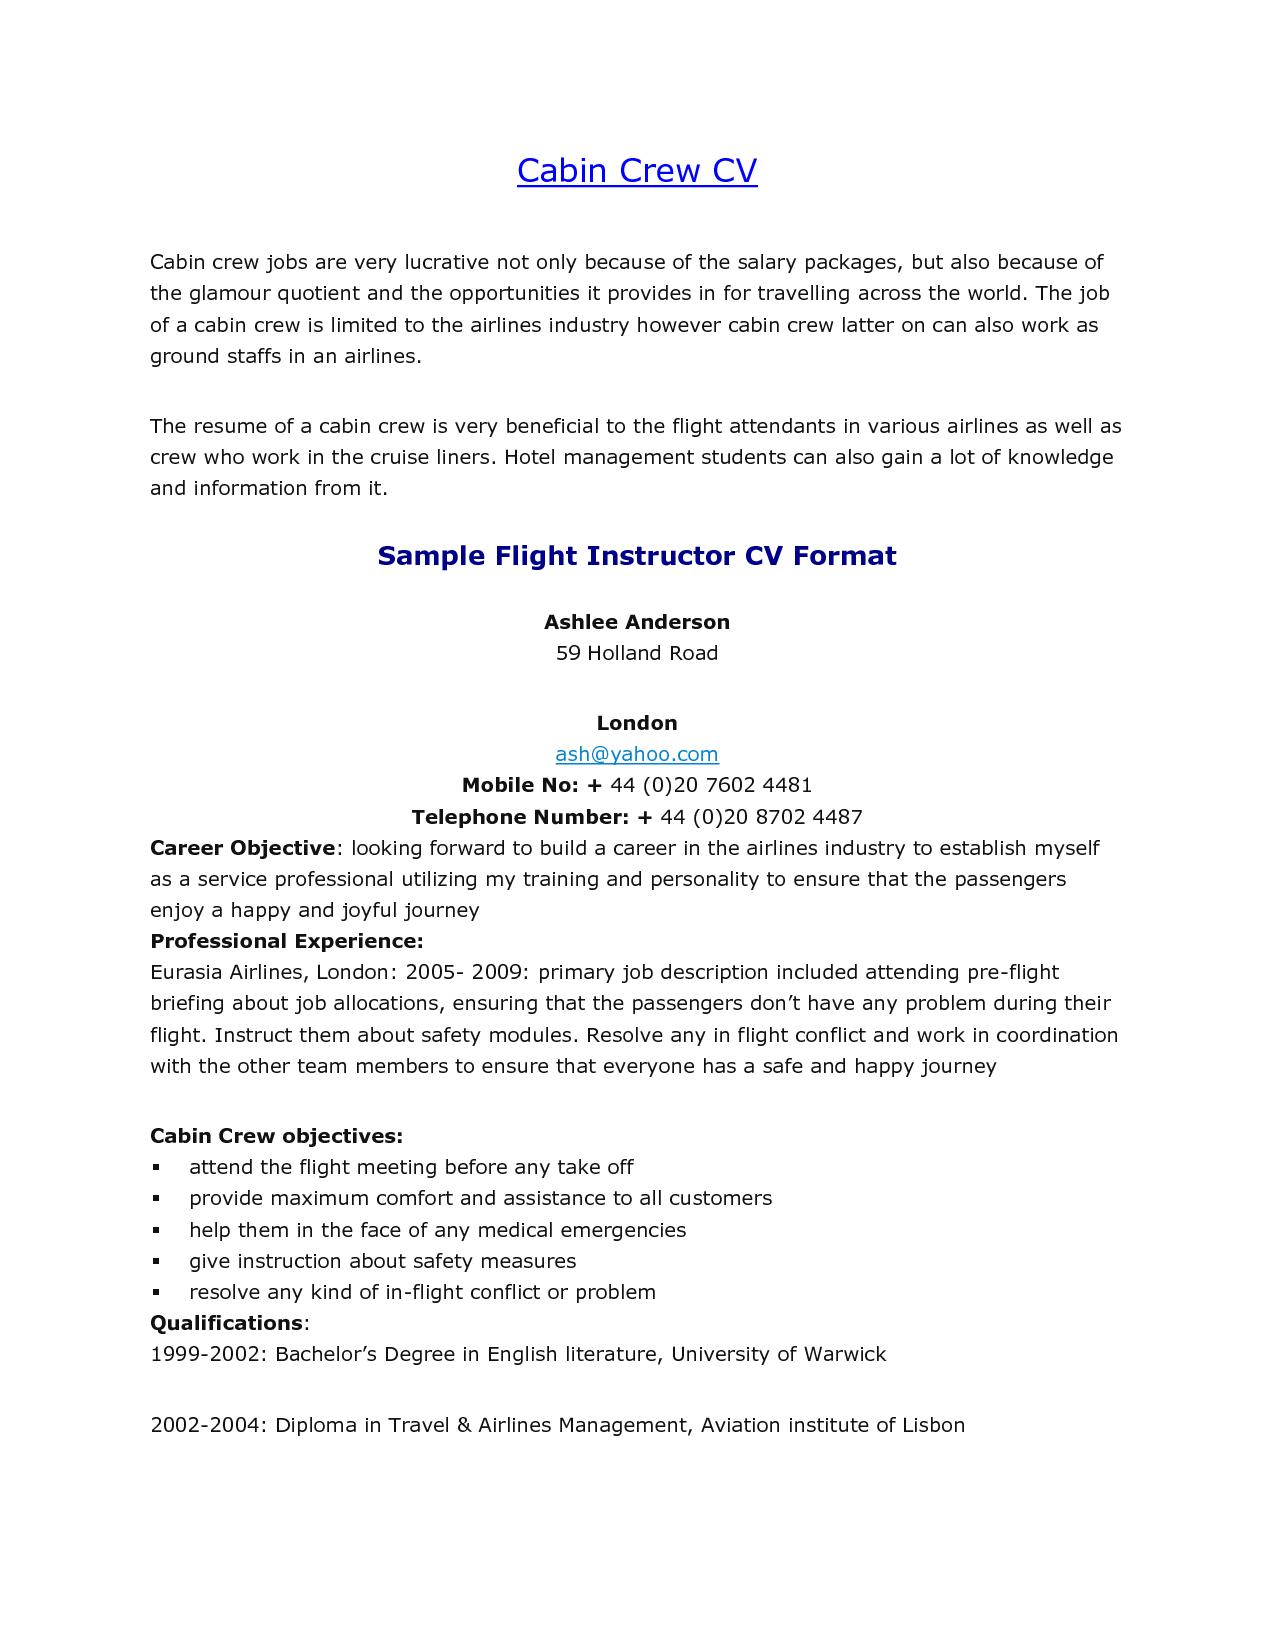 best solutions air canada flight attendant sample resume